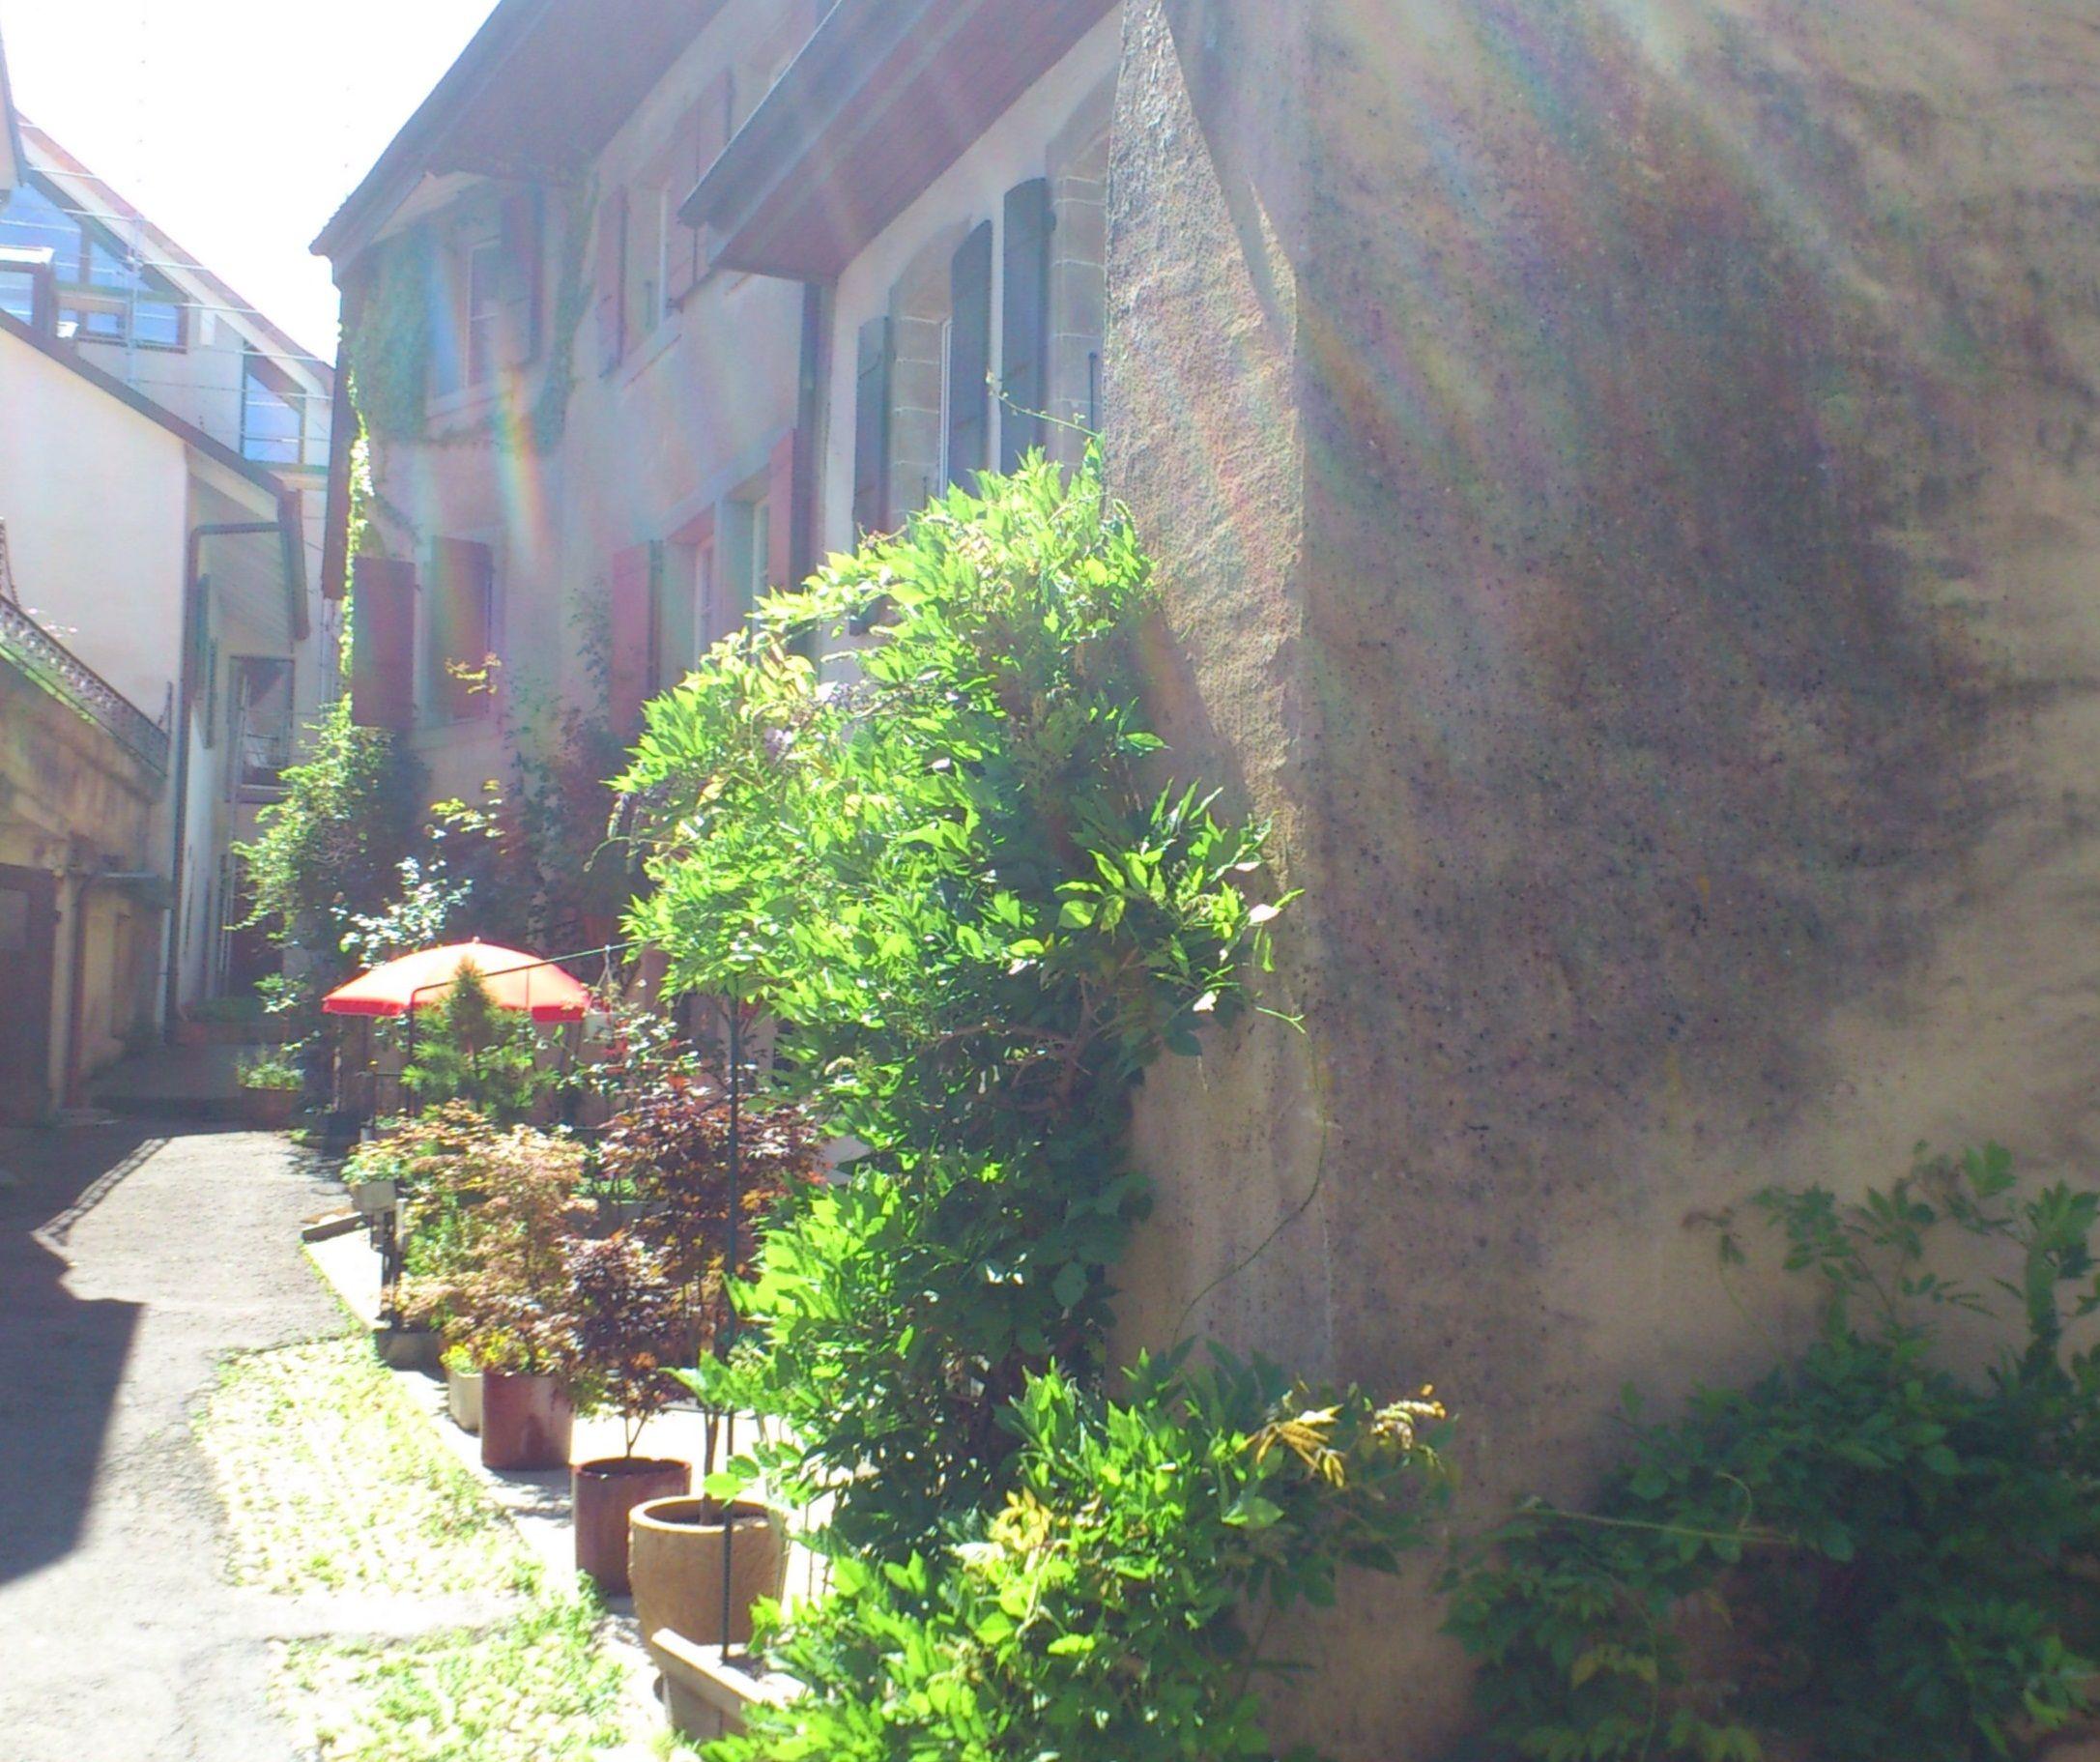 Aubonne (Switzerland)